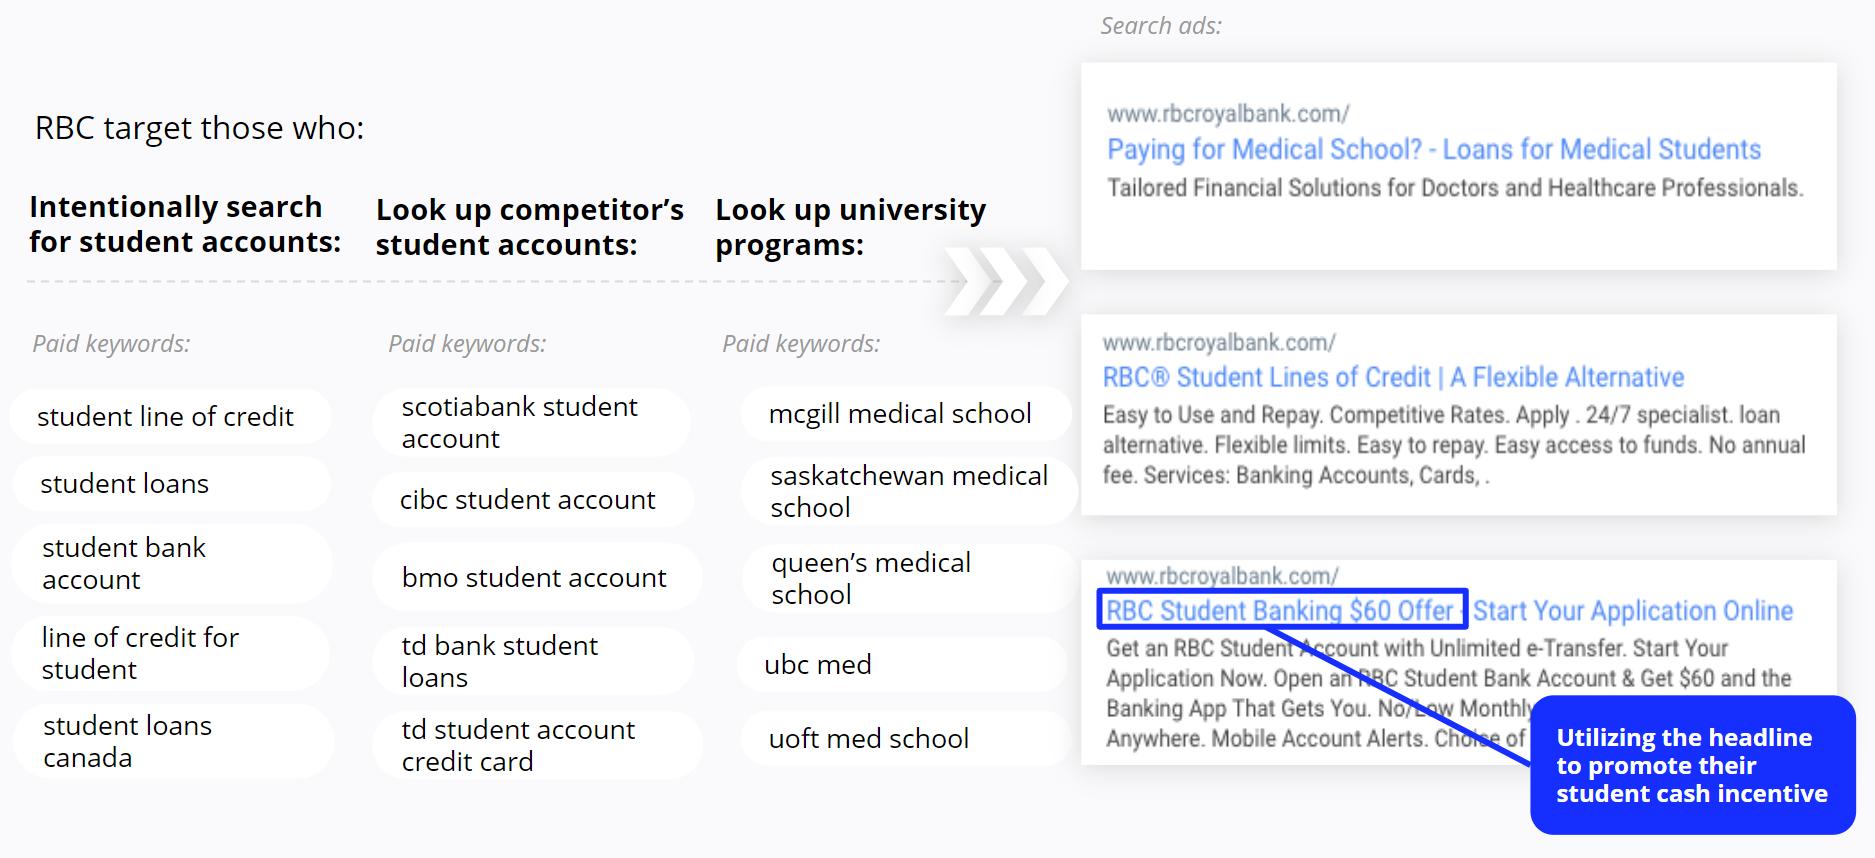 RBC - Search Ads